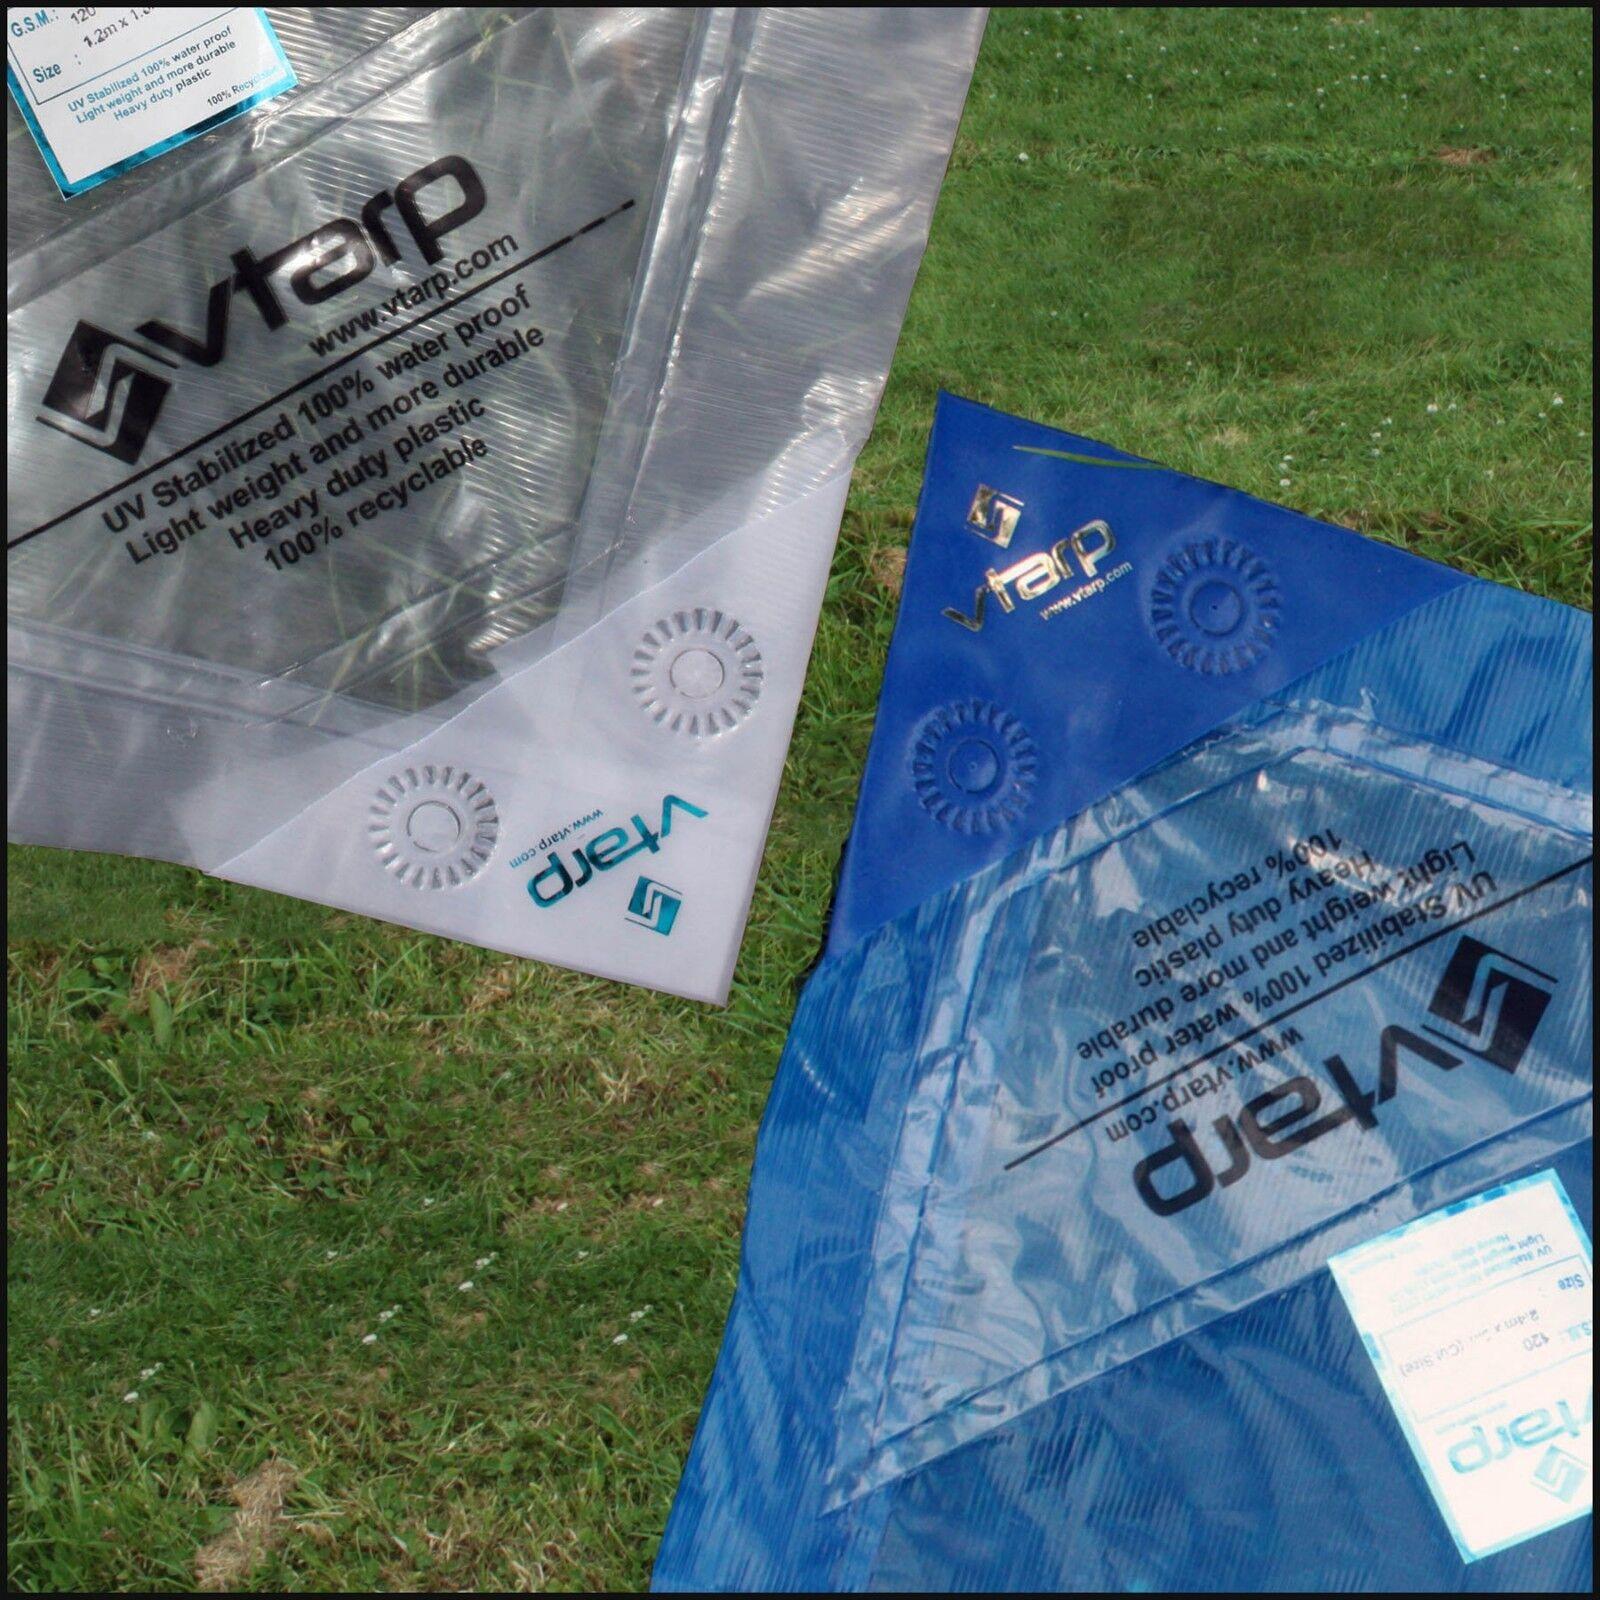 Vtarp ® HEAVY DUTY TARPAULIN WATERPROOF EX STRONG COVER GROUND SHEET TARP 120GSM